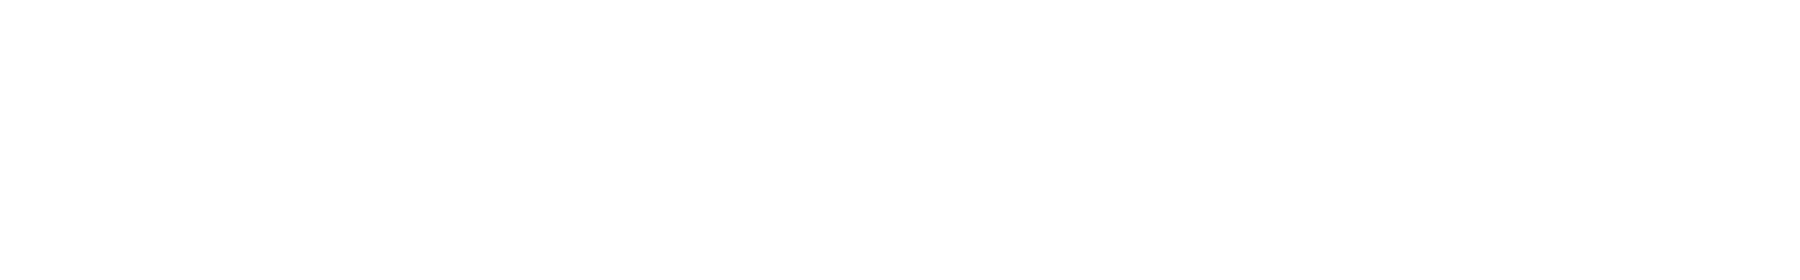 g abs05 062